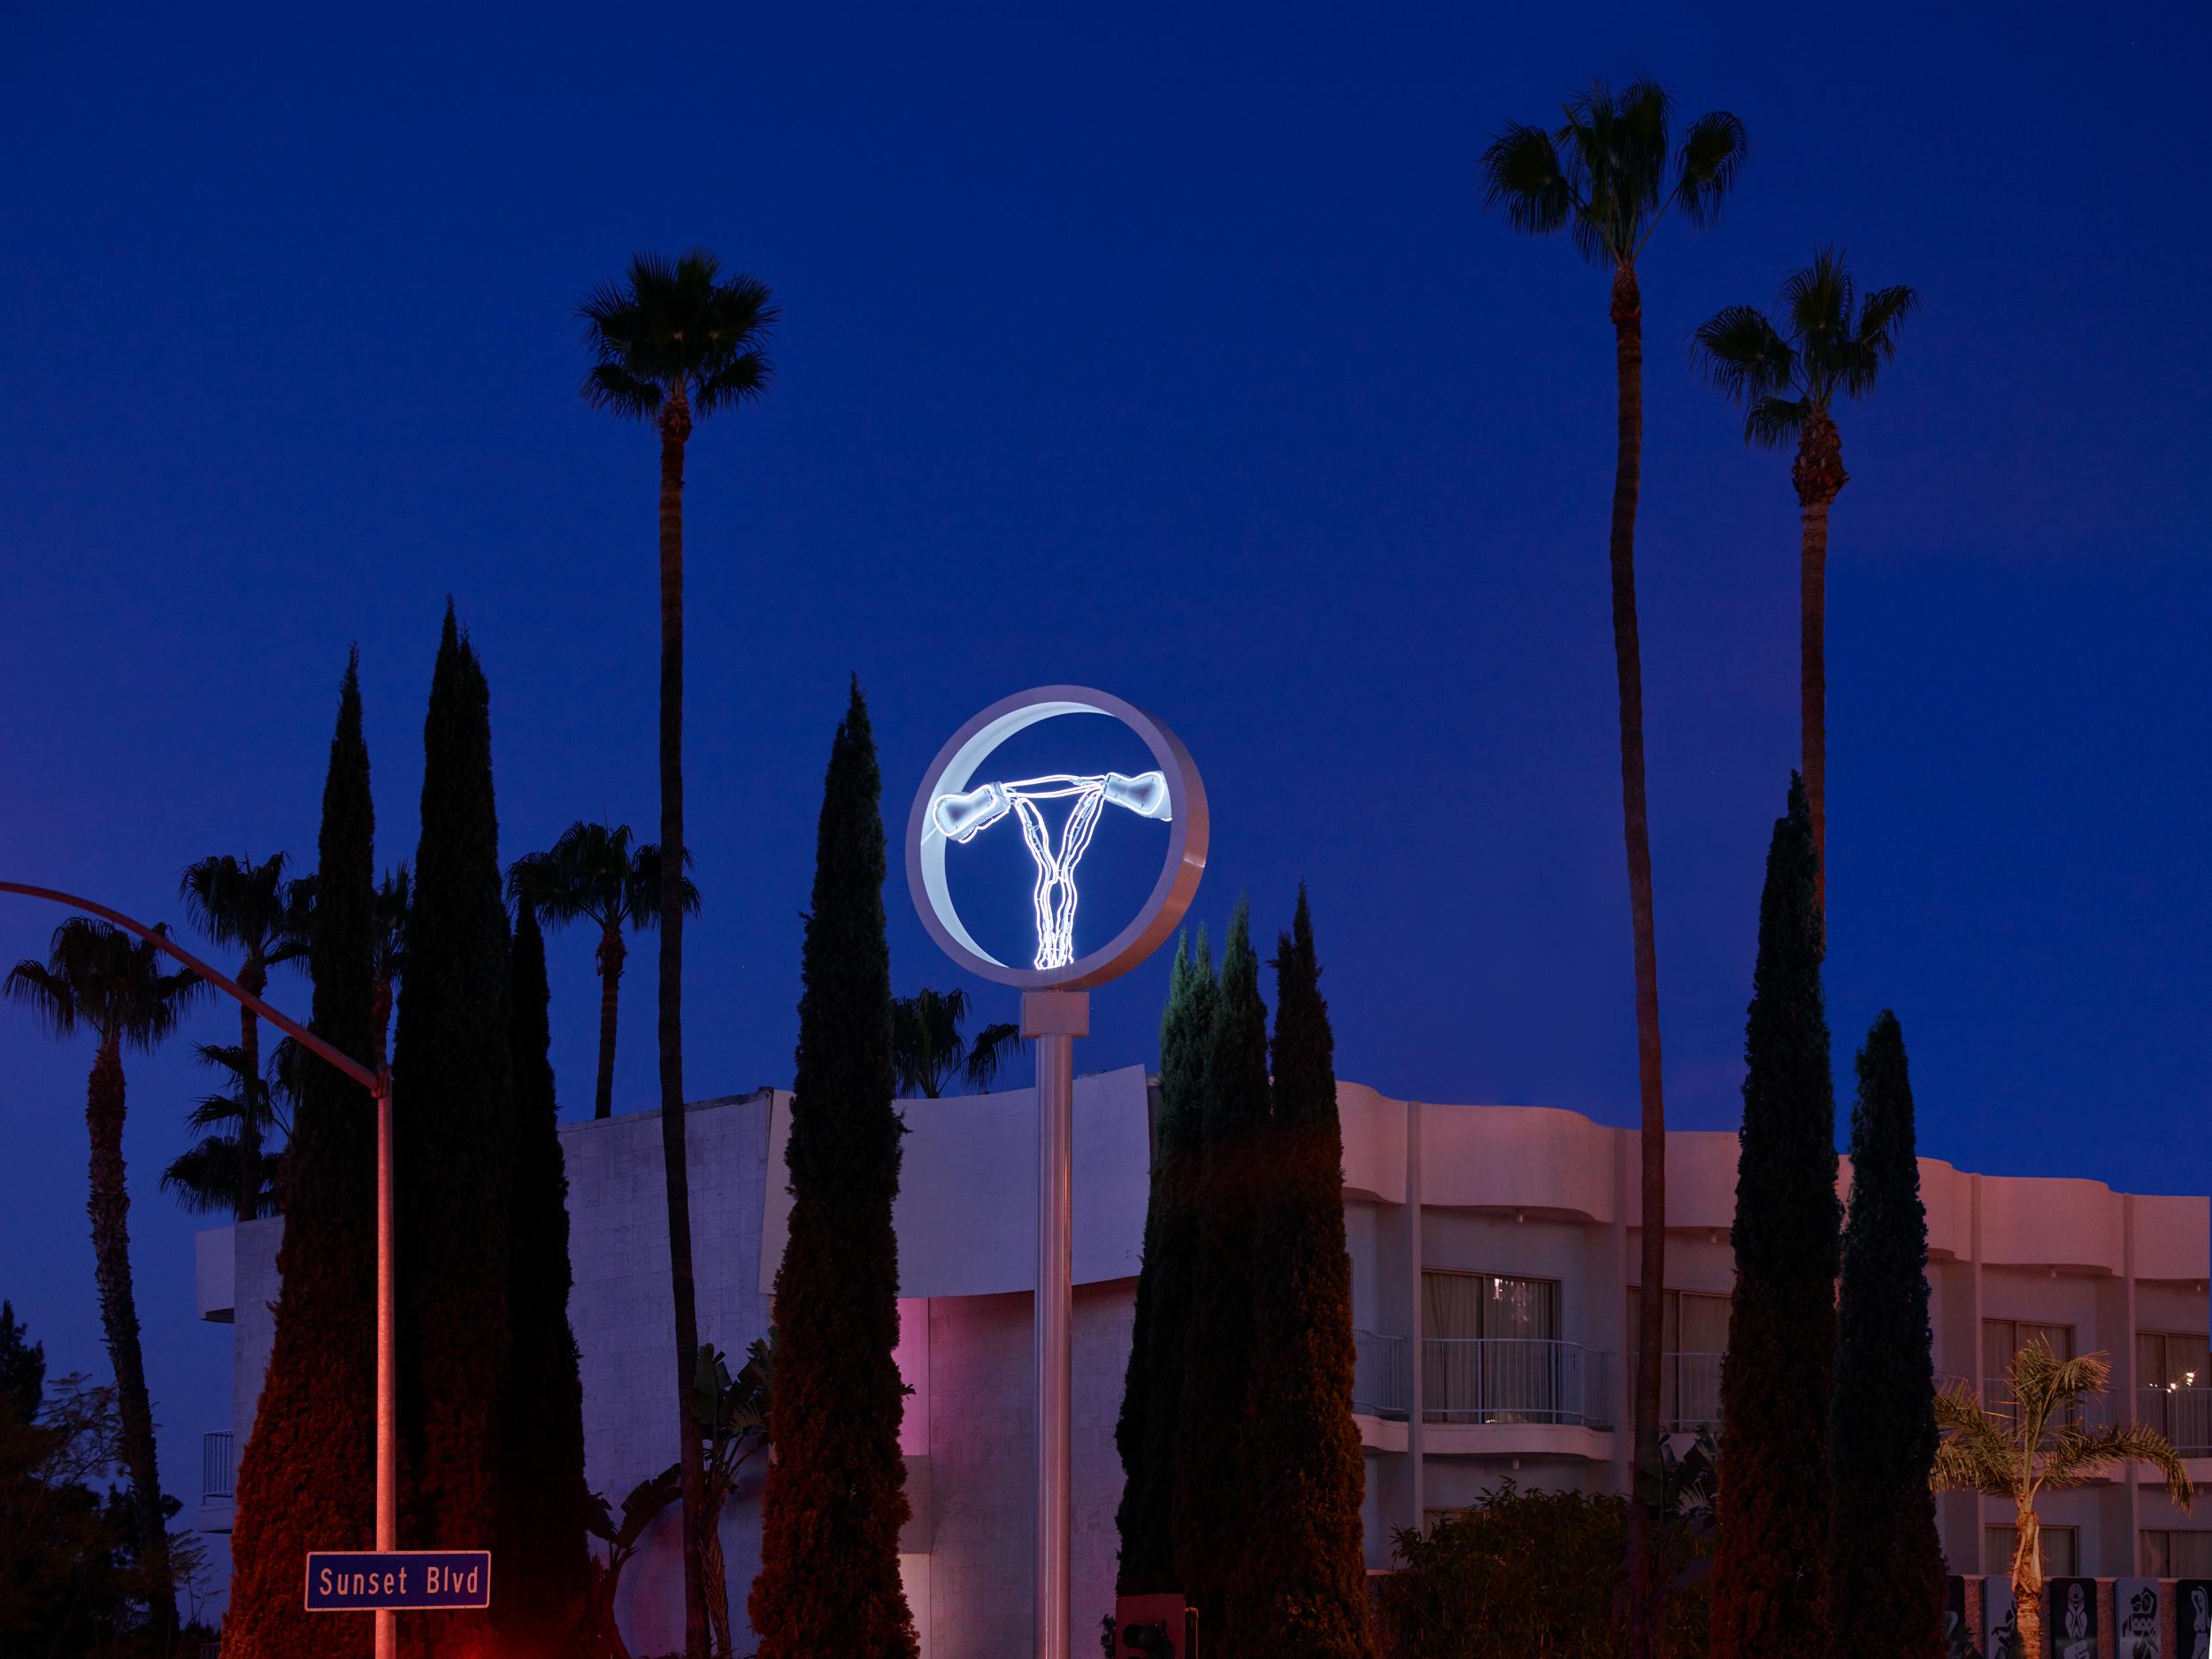 CHAMP Over the Standard Hotel on Sunset Boulevard